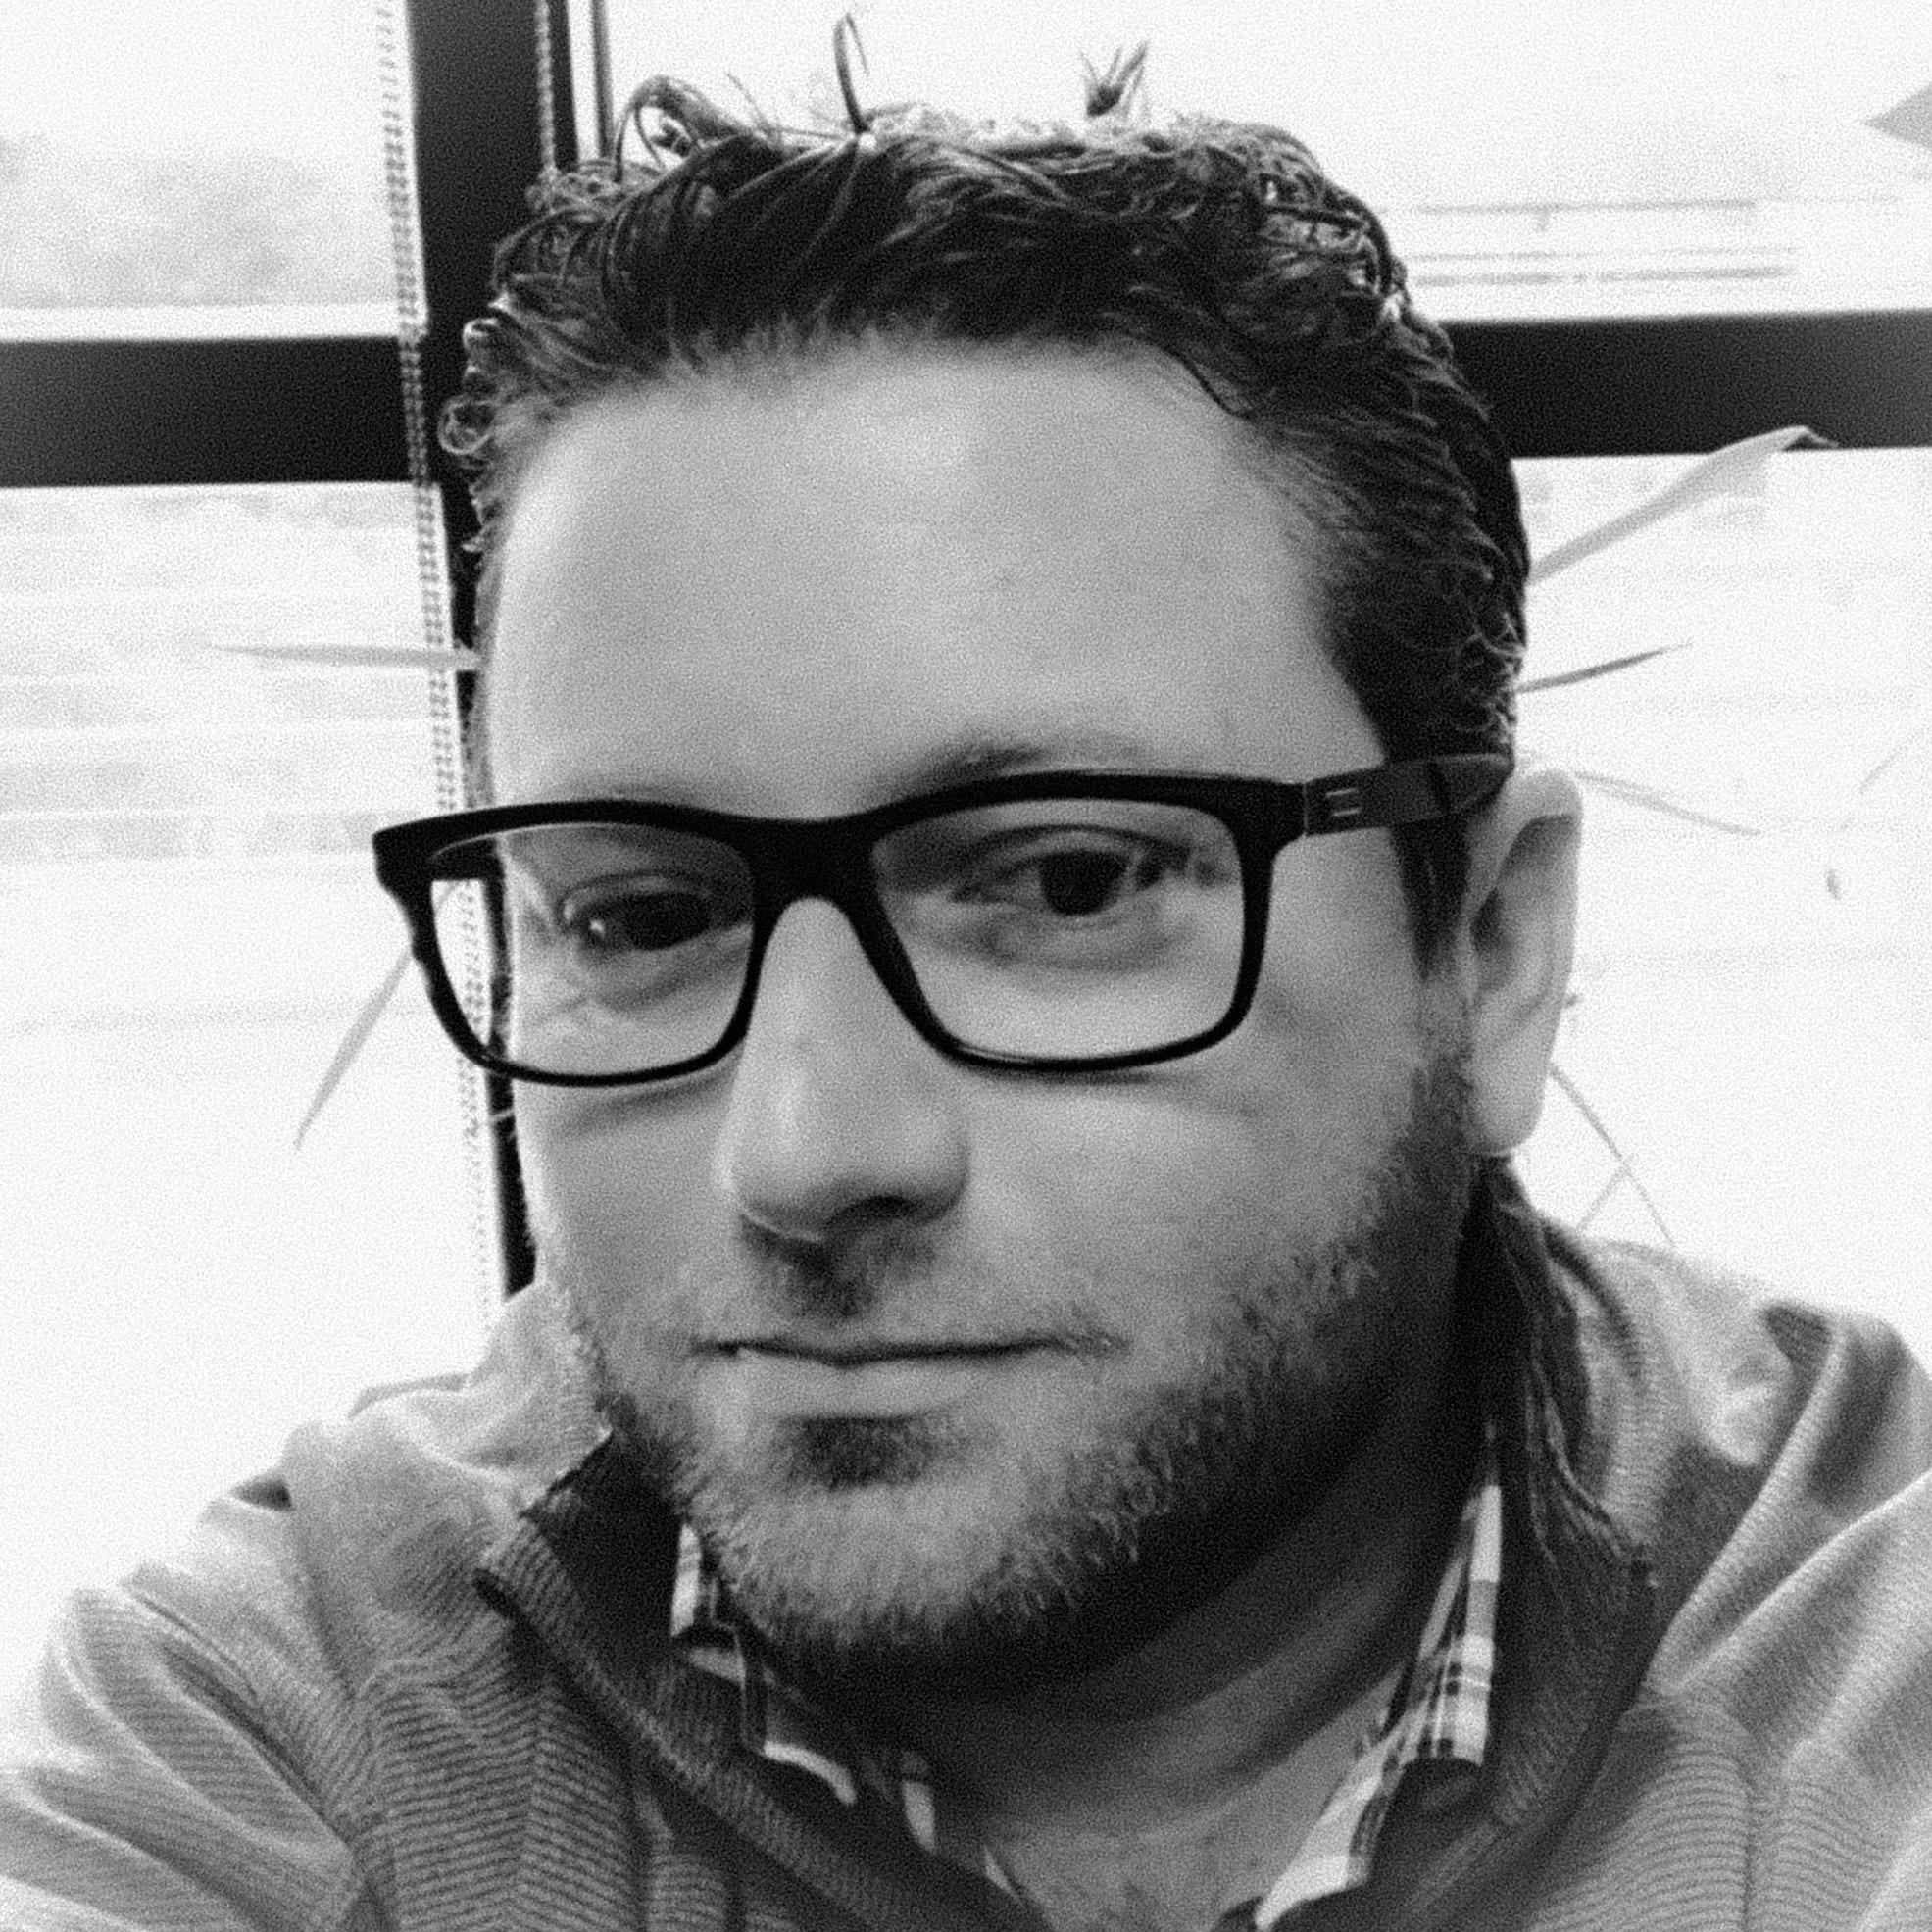 DAVE KNOTT - Chief Executive Officerdave@hollywoodfilmfestival.com[ View Bio ]